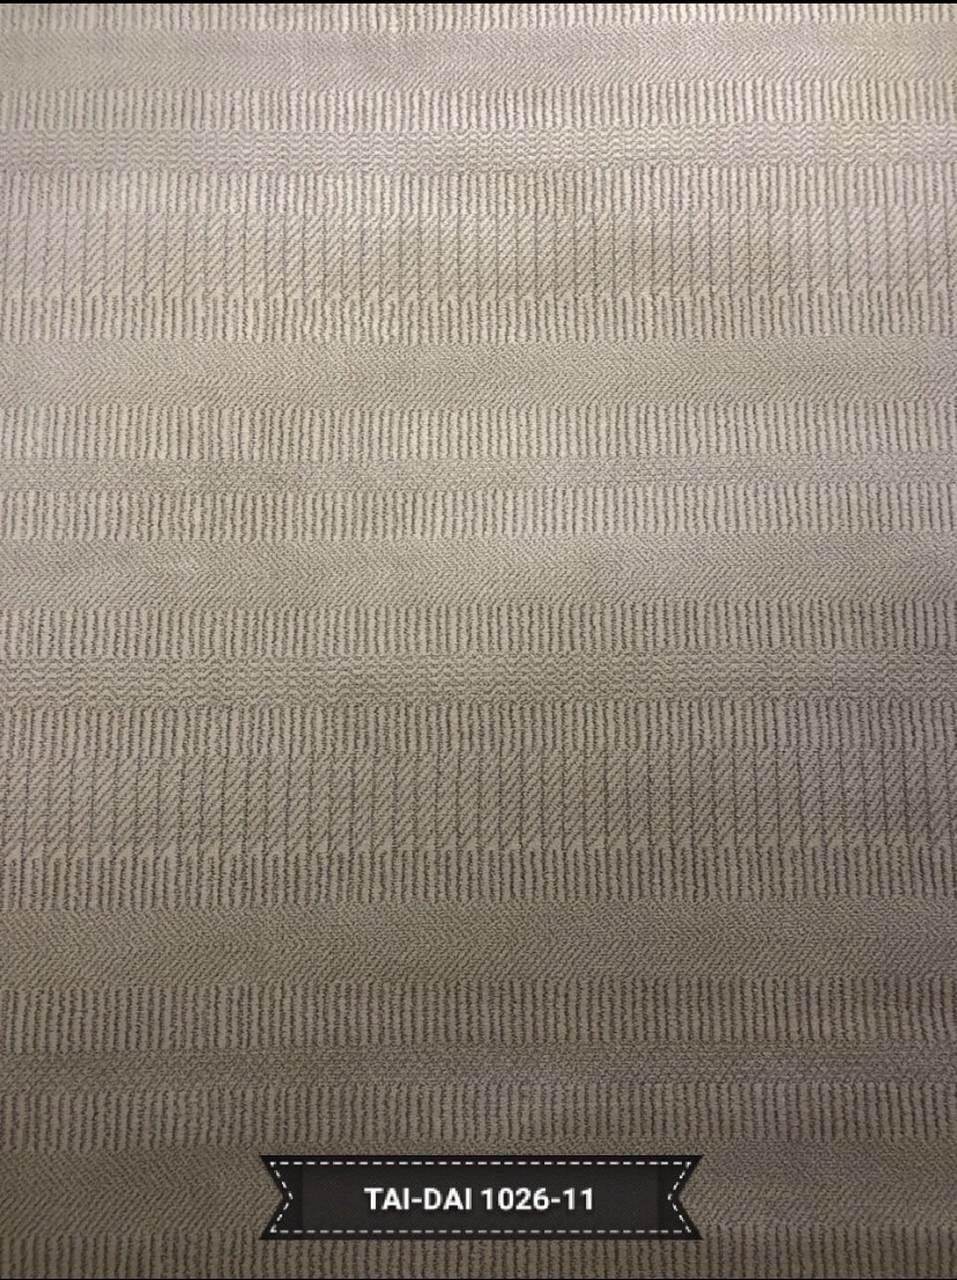 Tapete Tai Dai ref. 1026-11 - 200 x 300 cm